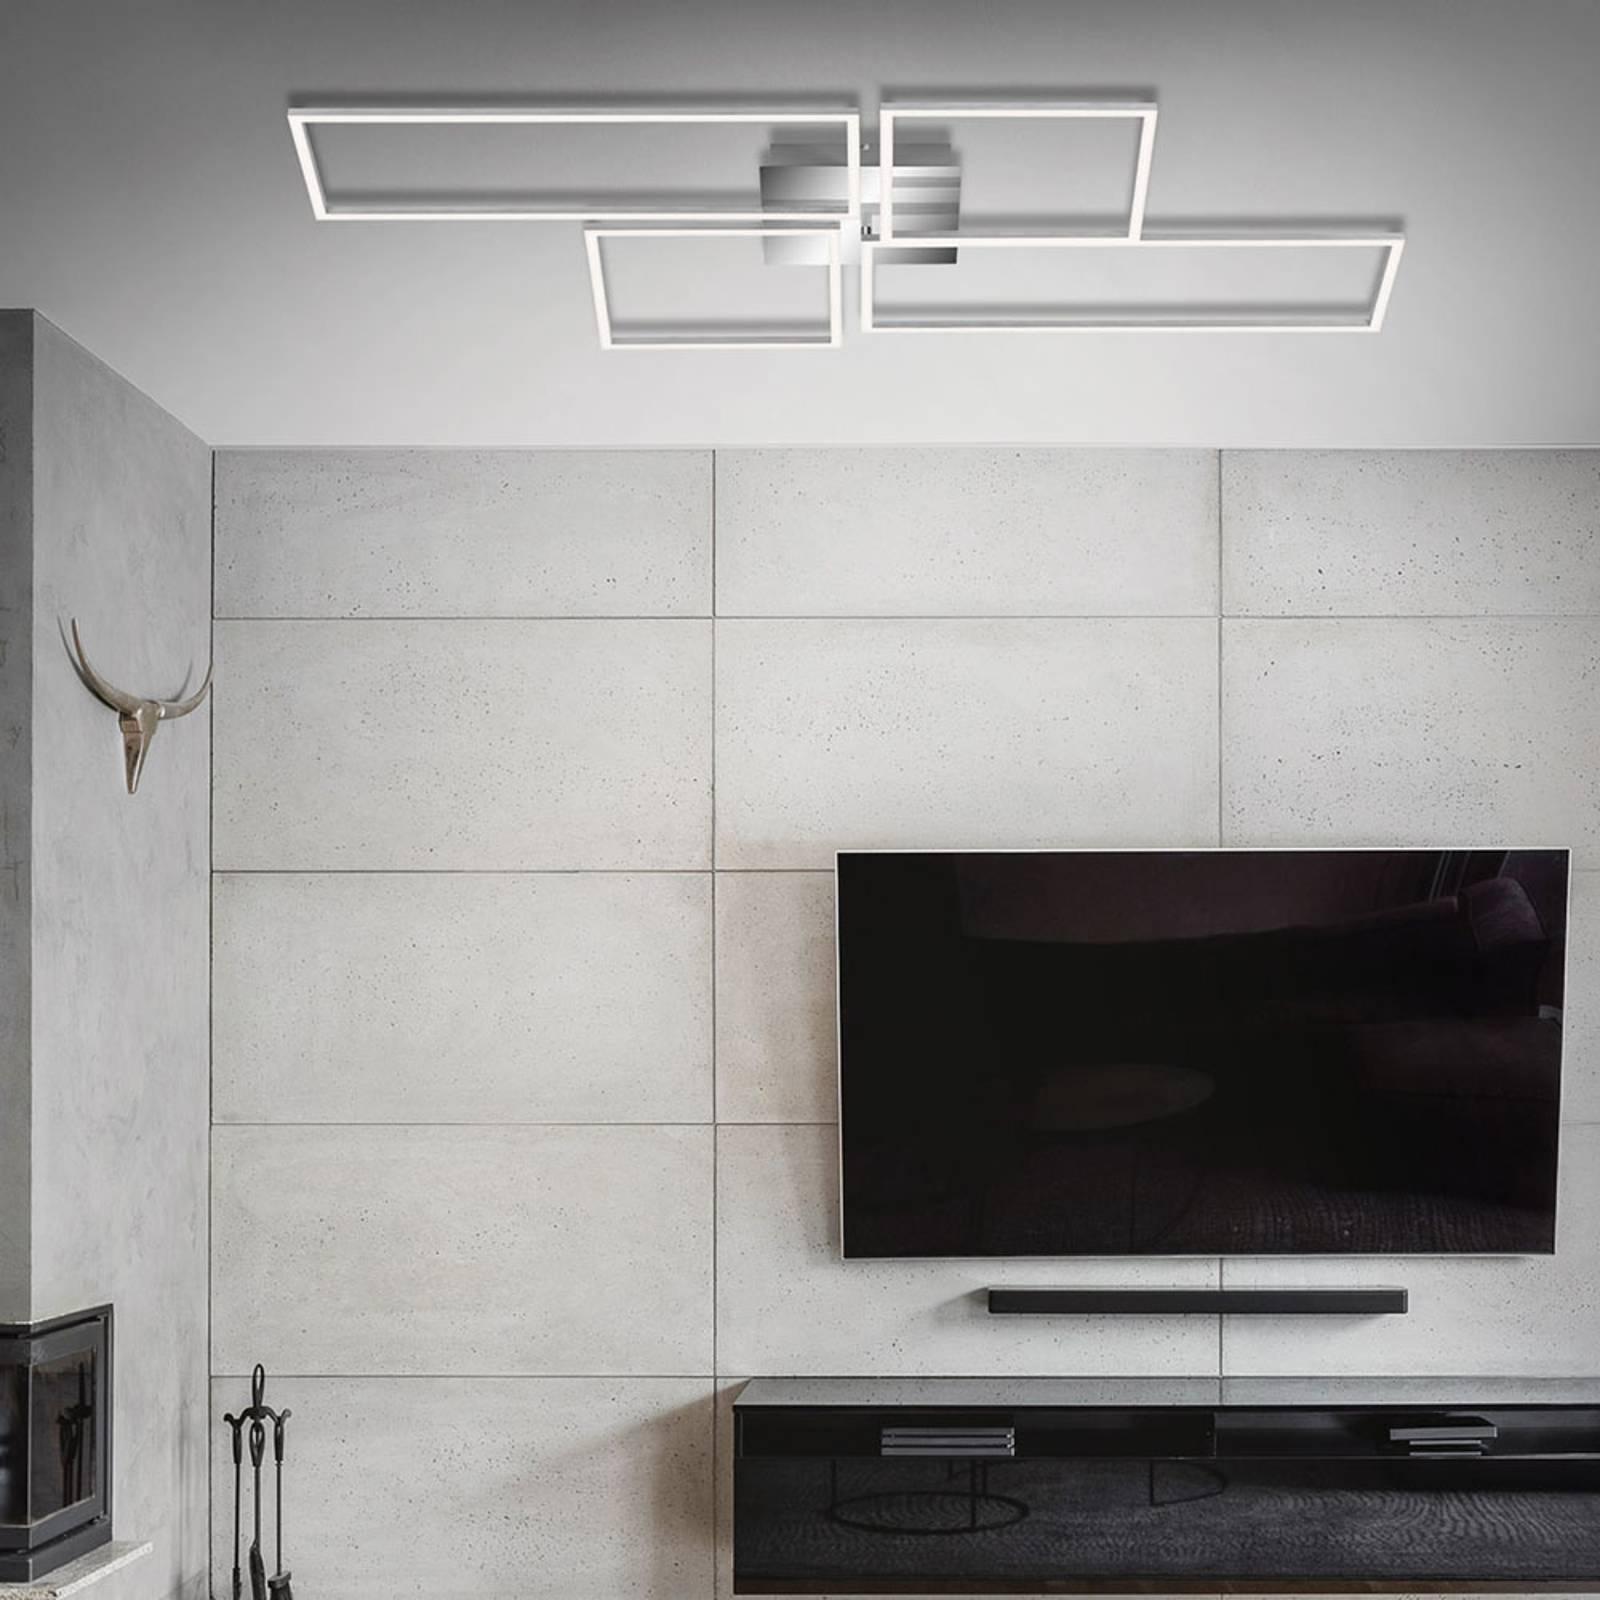 LED plafondlamp Frame CCT, chroom-alu, 110x54cm